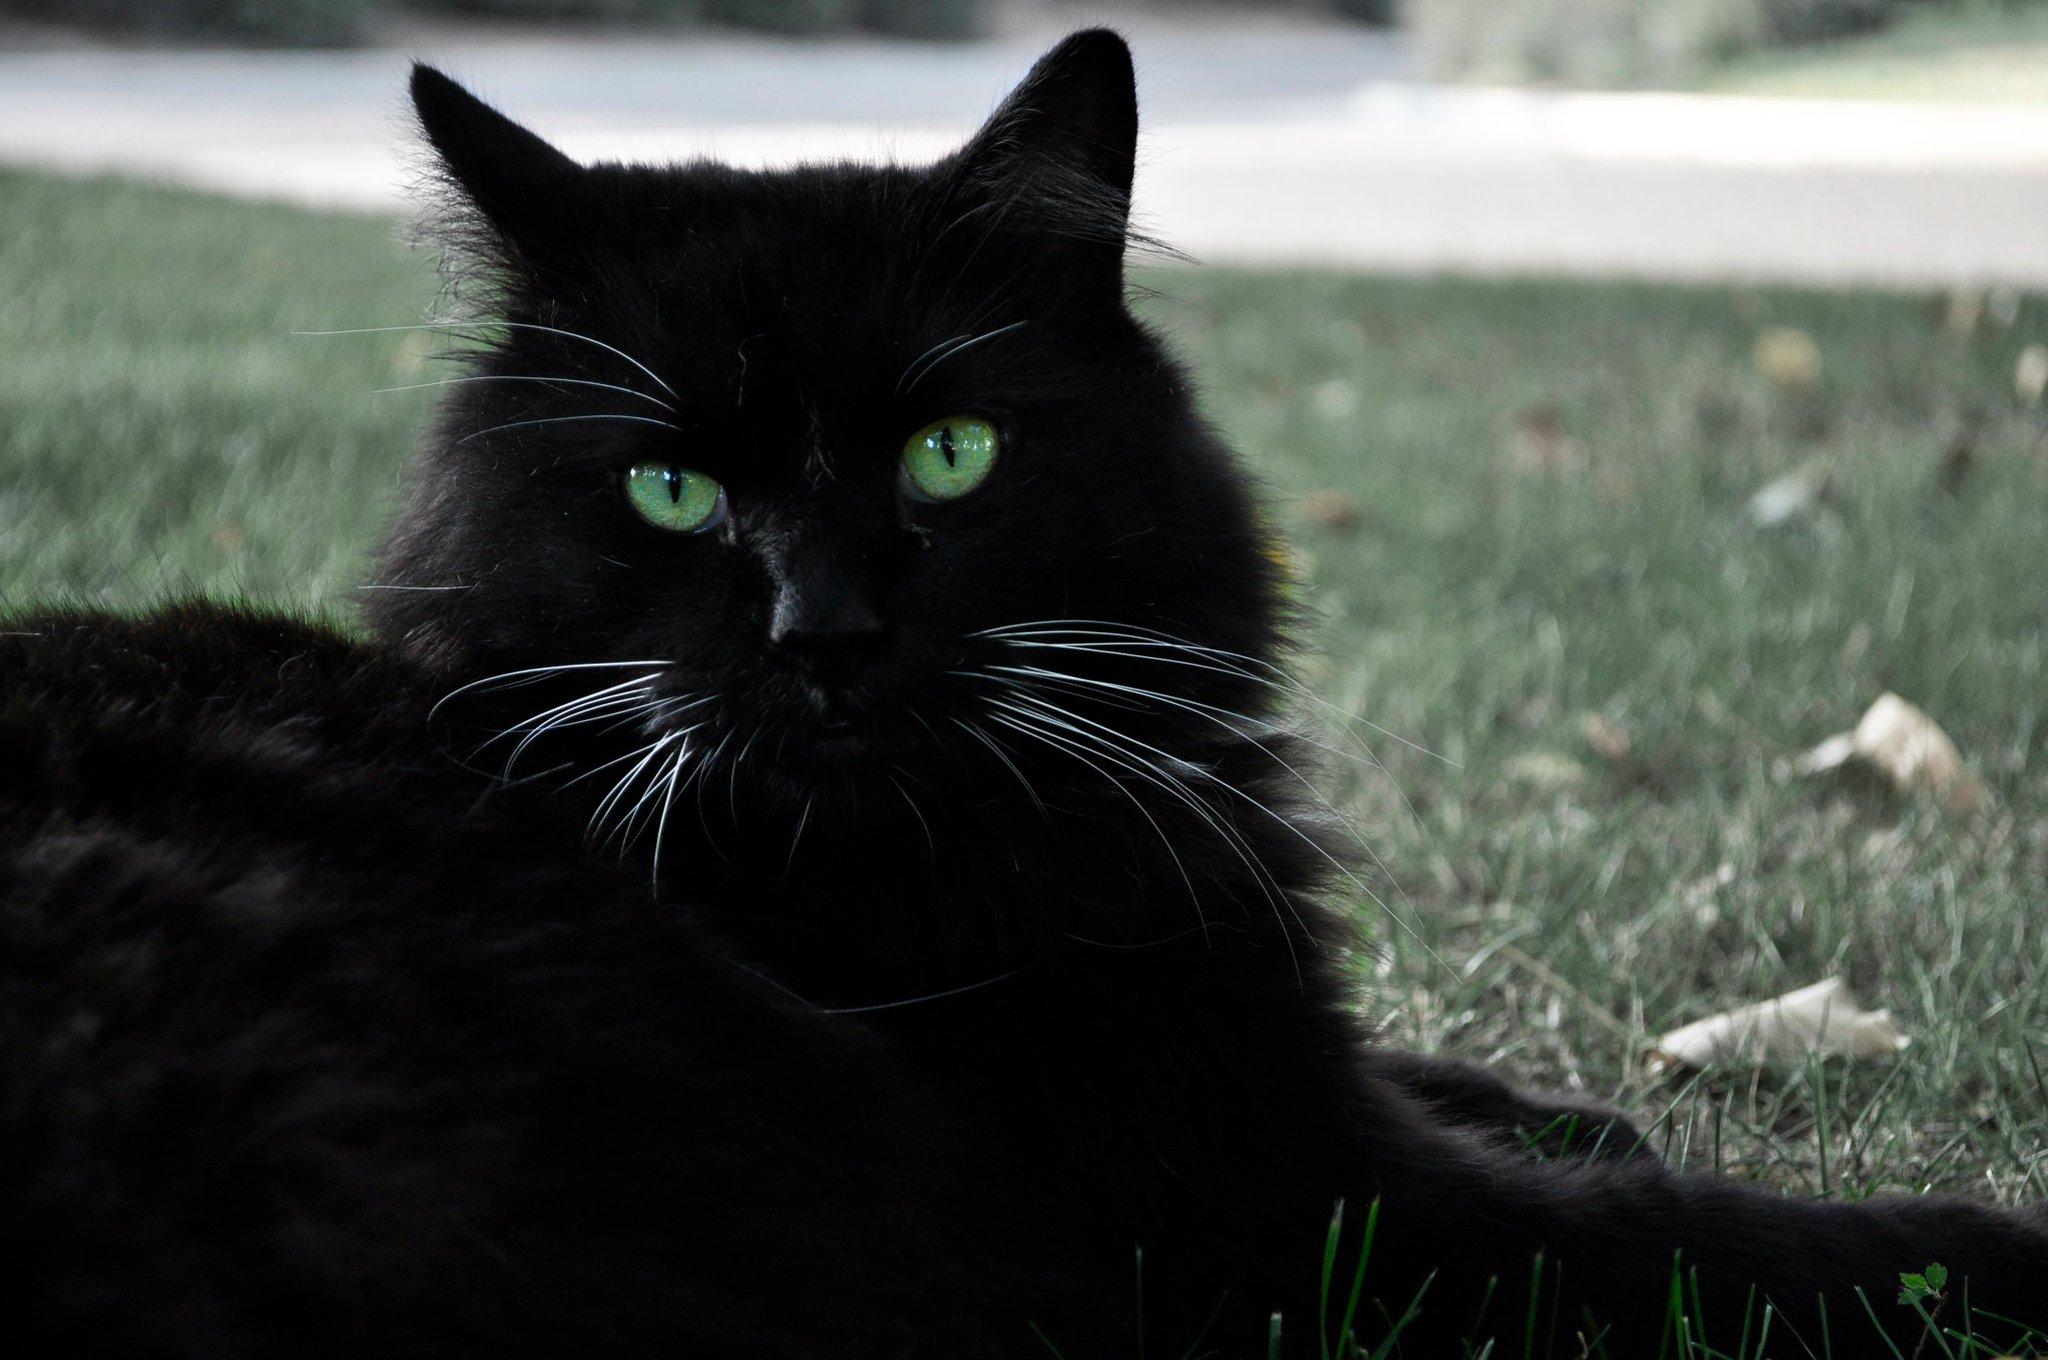 green_eyes_for_black_cats_by_nativekokopelli-d3ezdwx.jpg